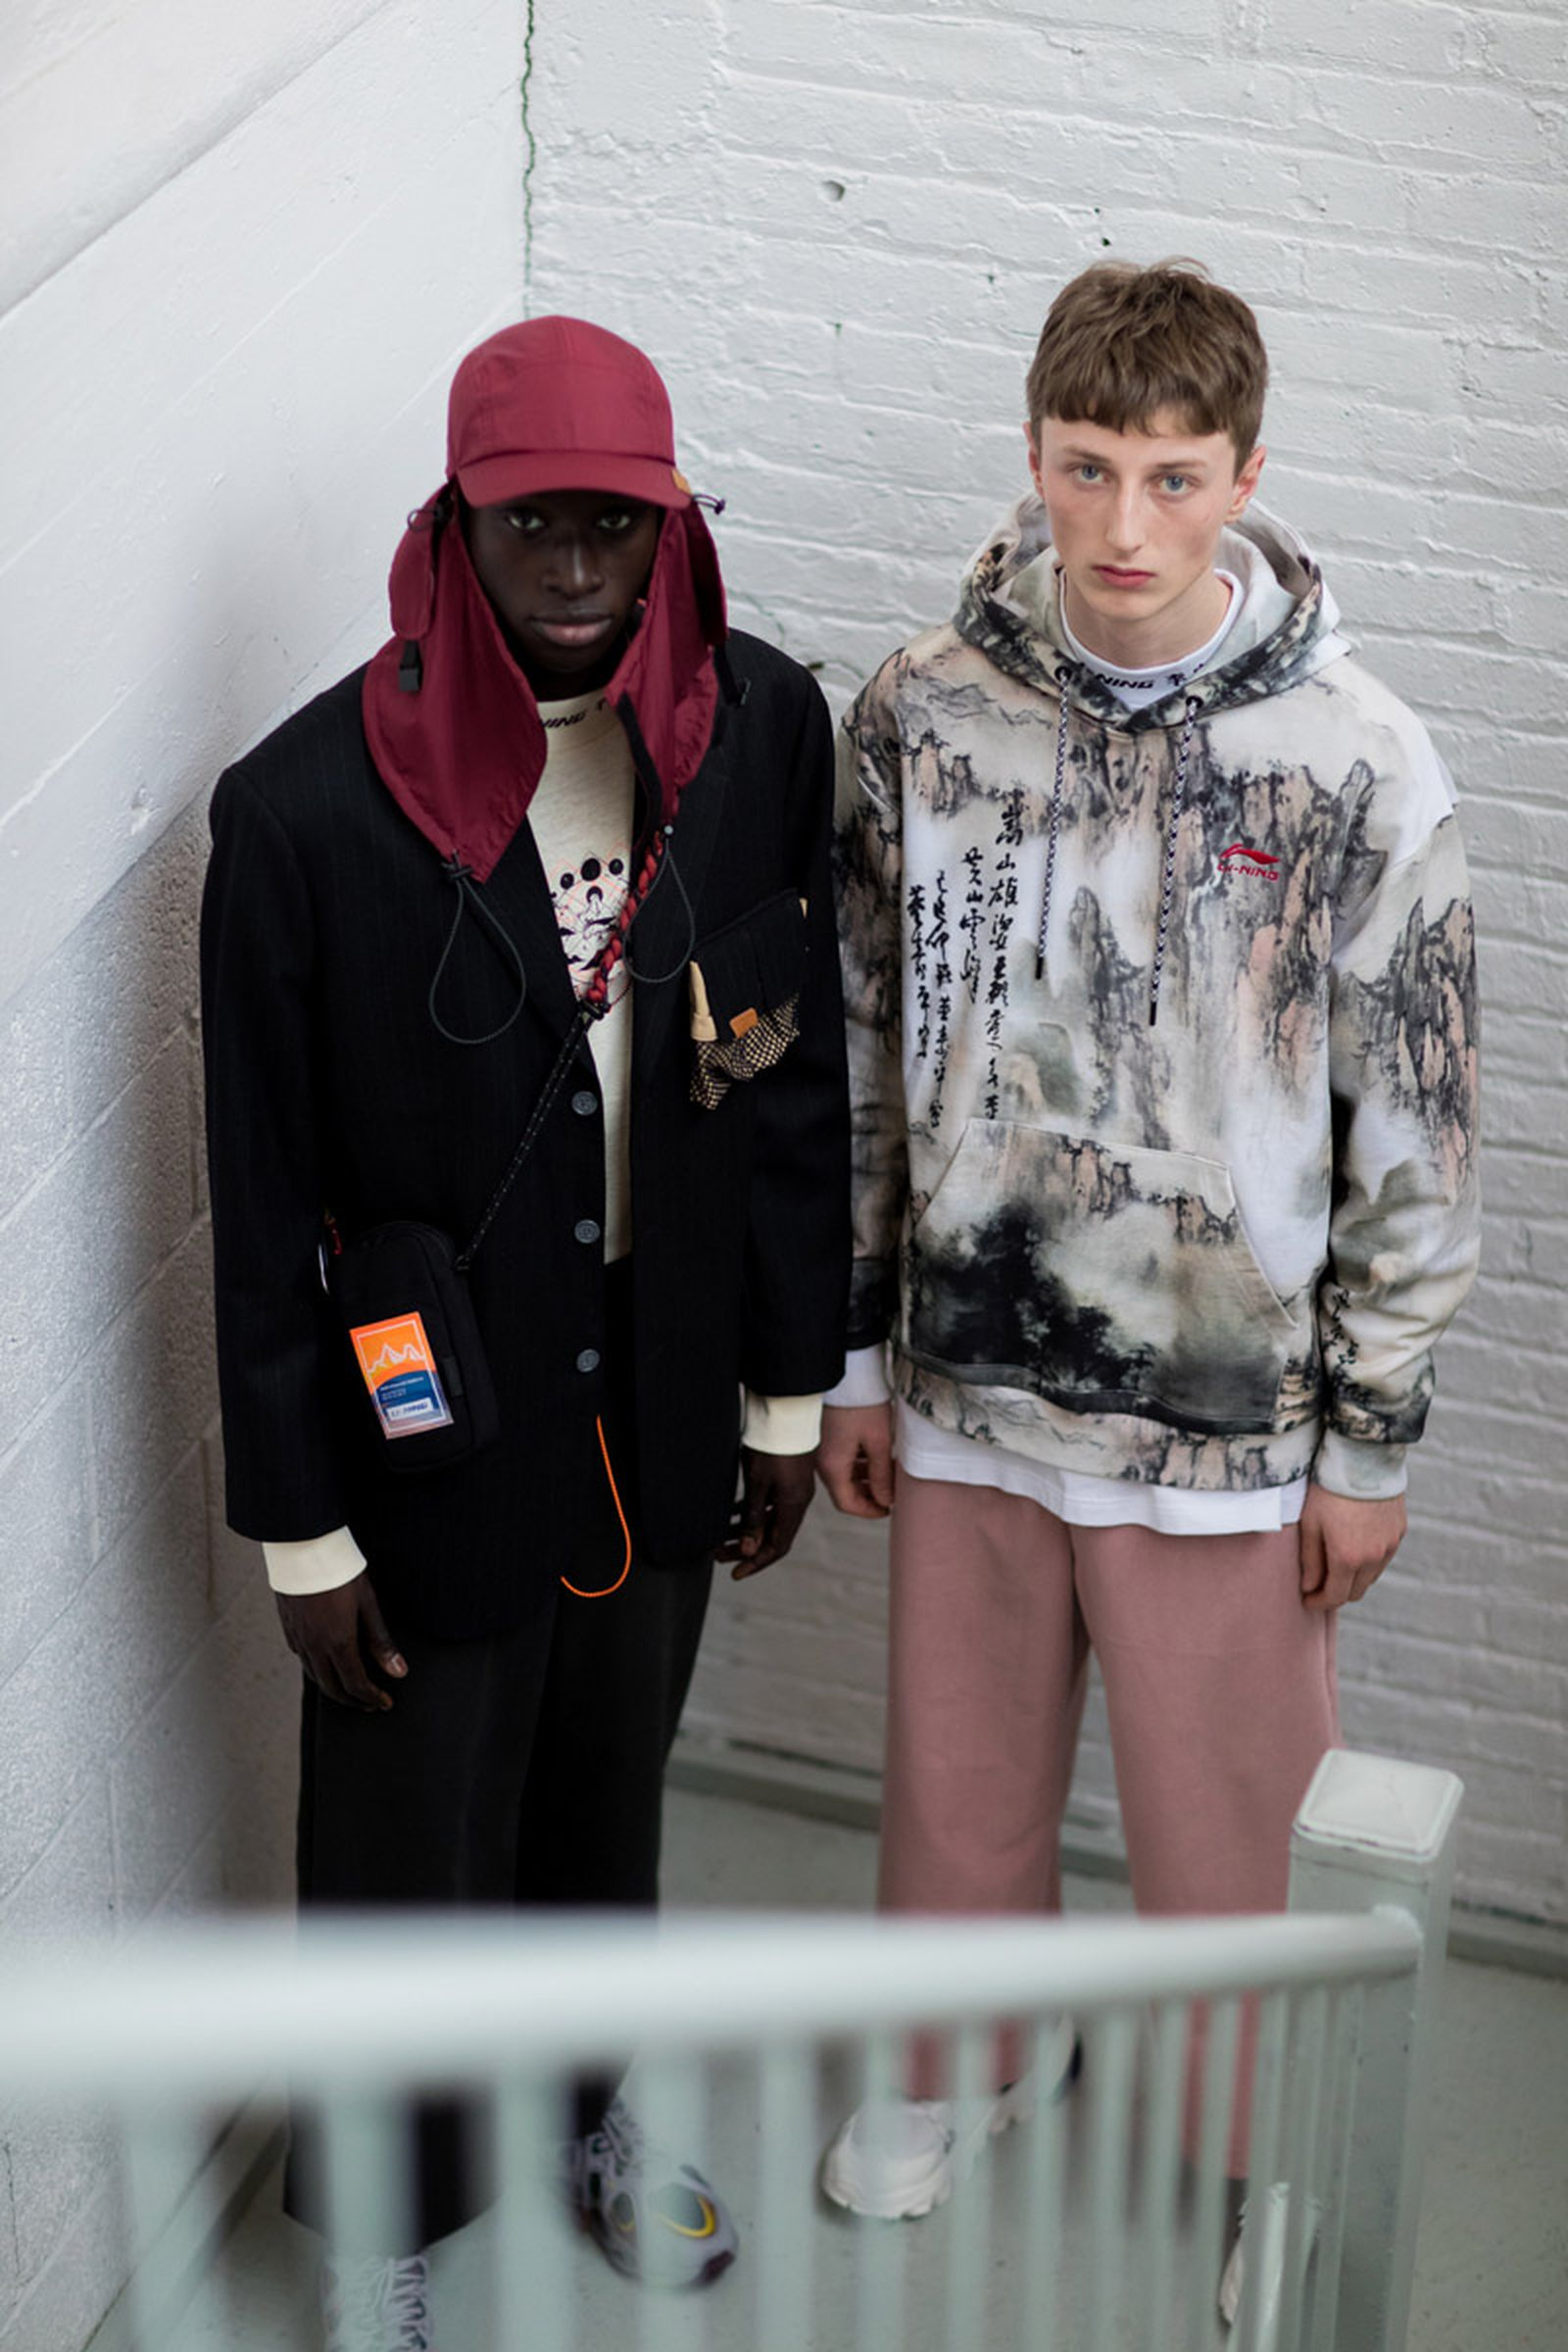 1li ning fw19 new york fashion week fall winter 2019 fashion shows nyfw